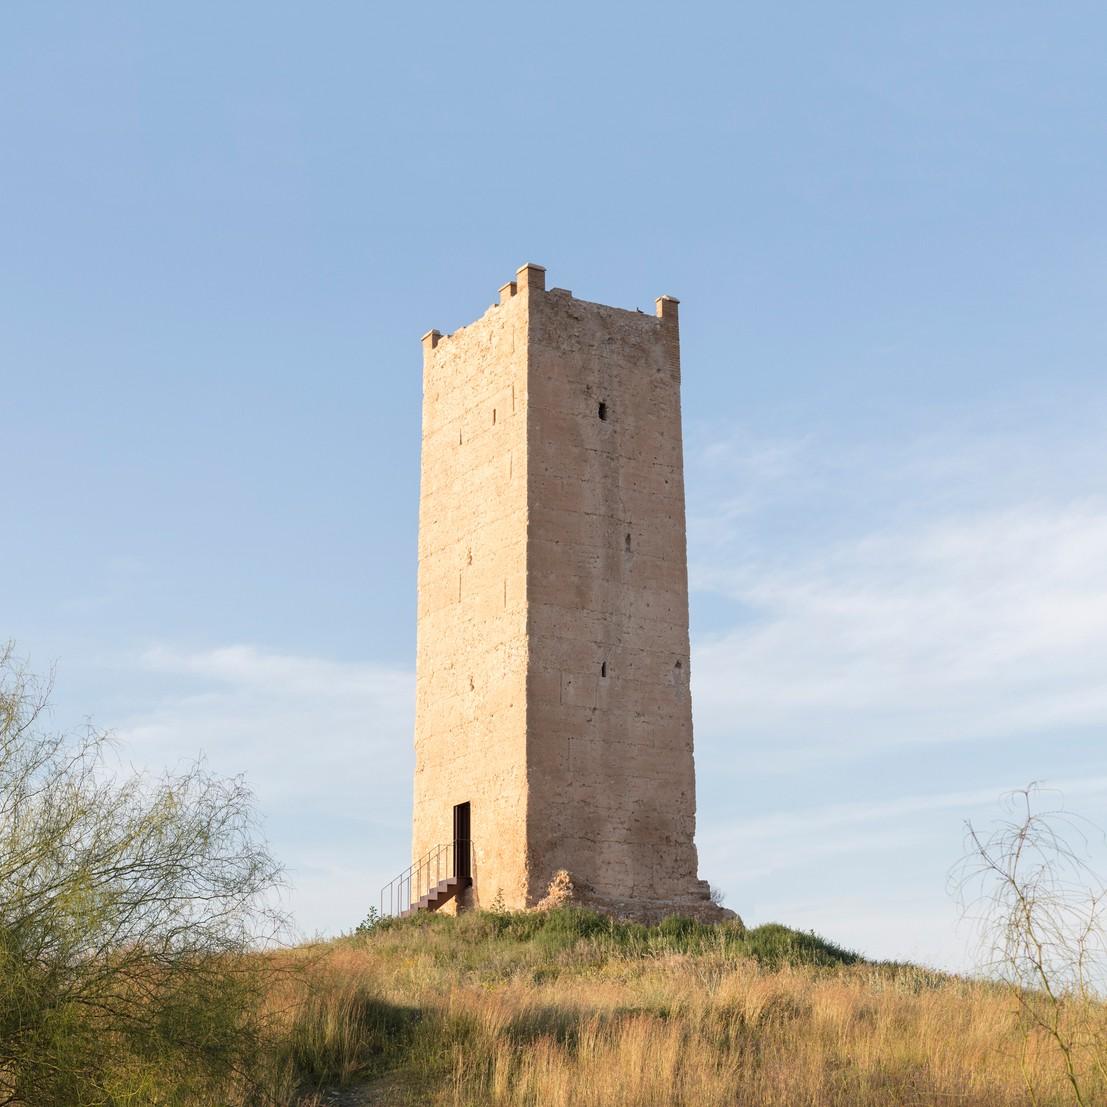 005-torre-espioca-c-milena-villalba-2020.jpg